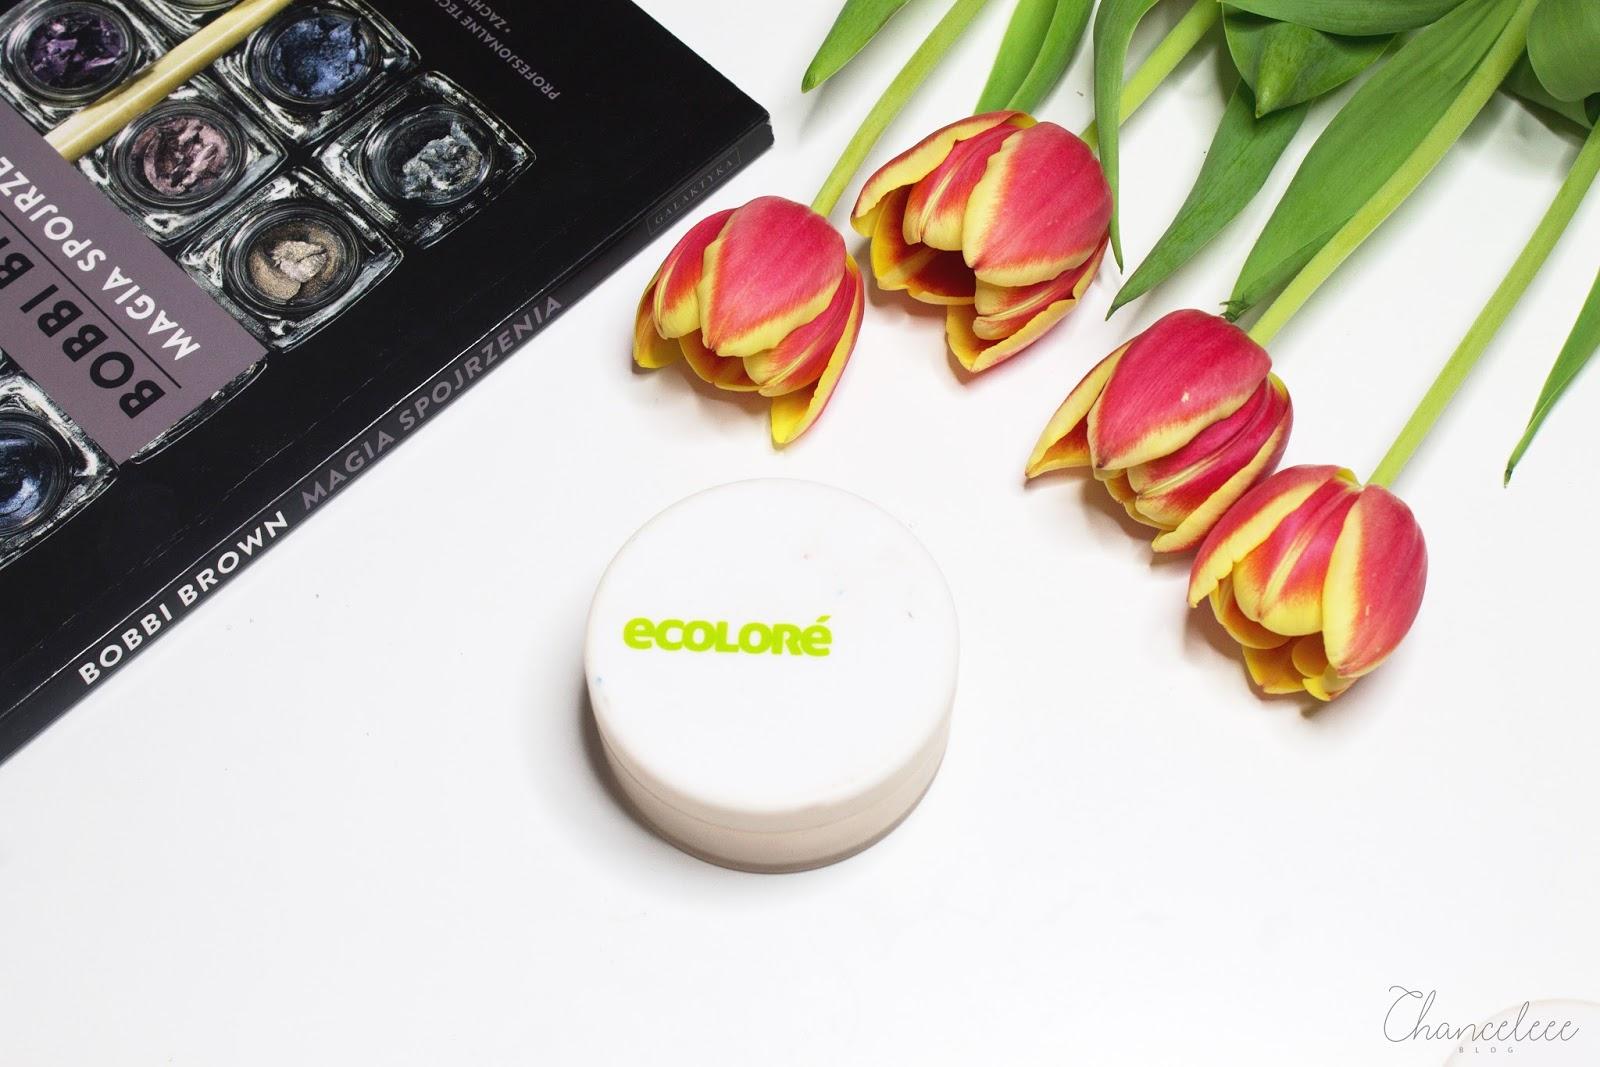 naturalne kosmetyki do makijażu ecolore